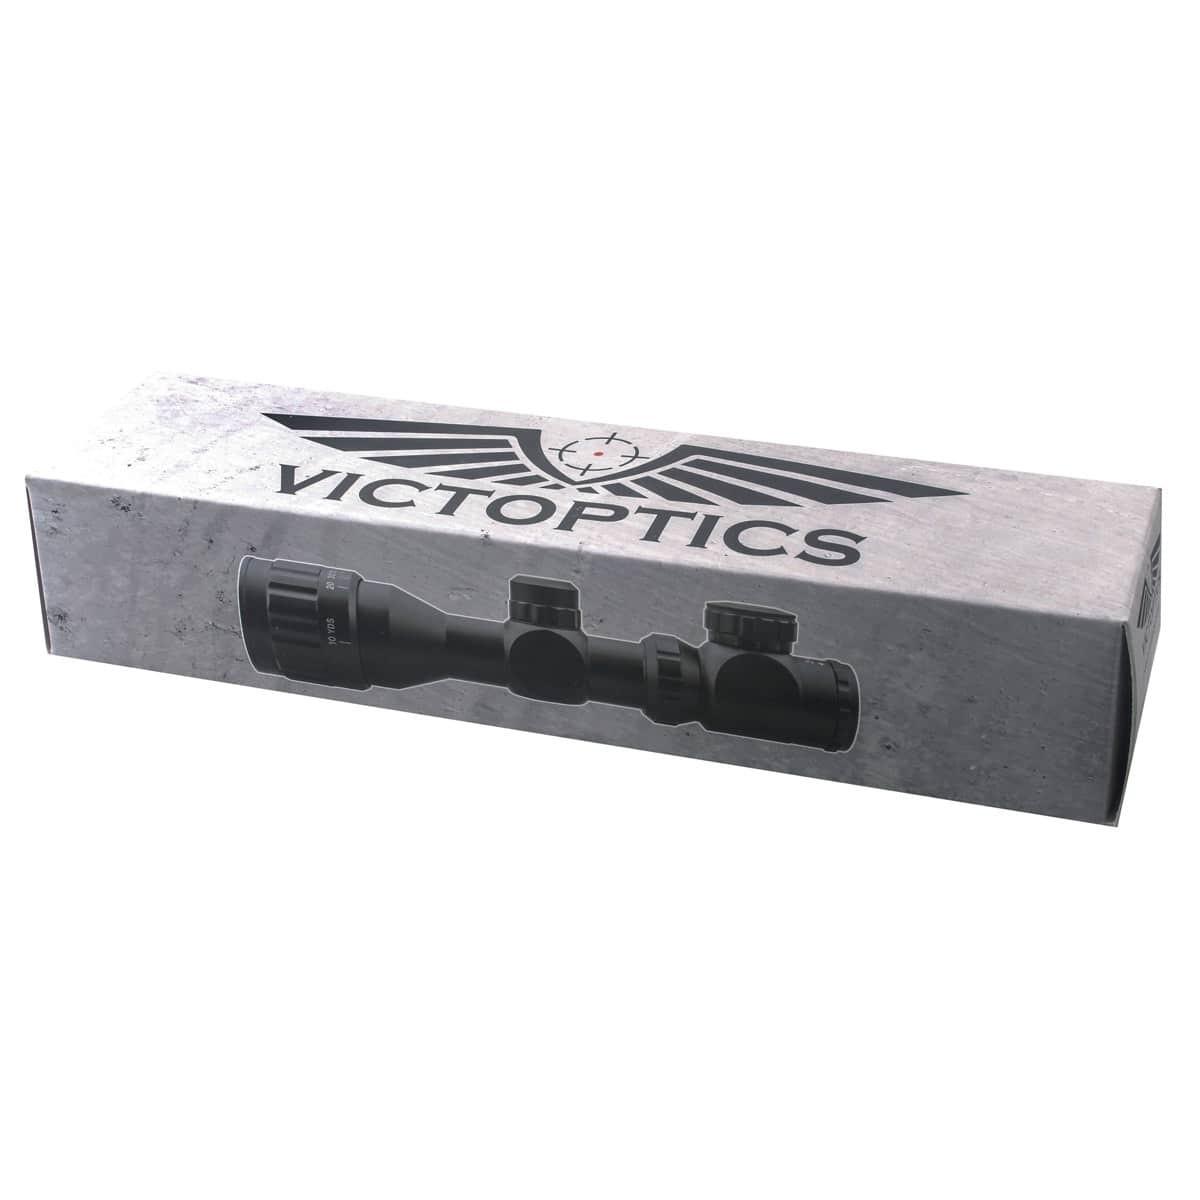 Victoptics 2-6x32AOE